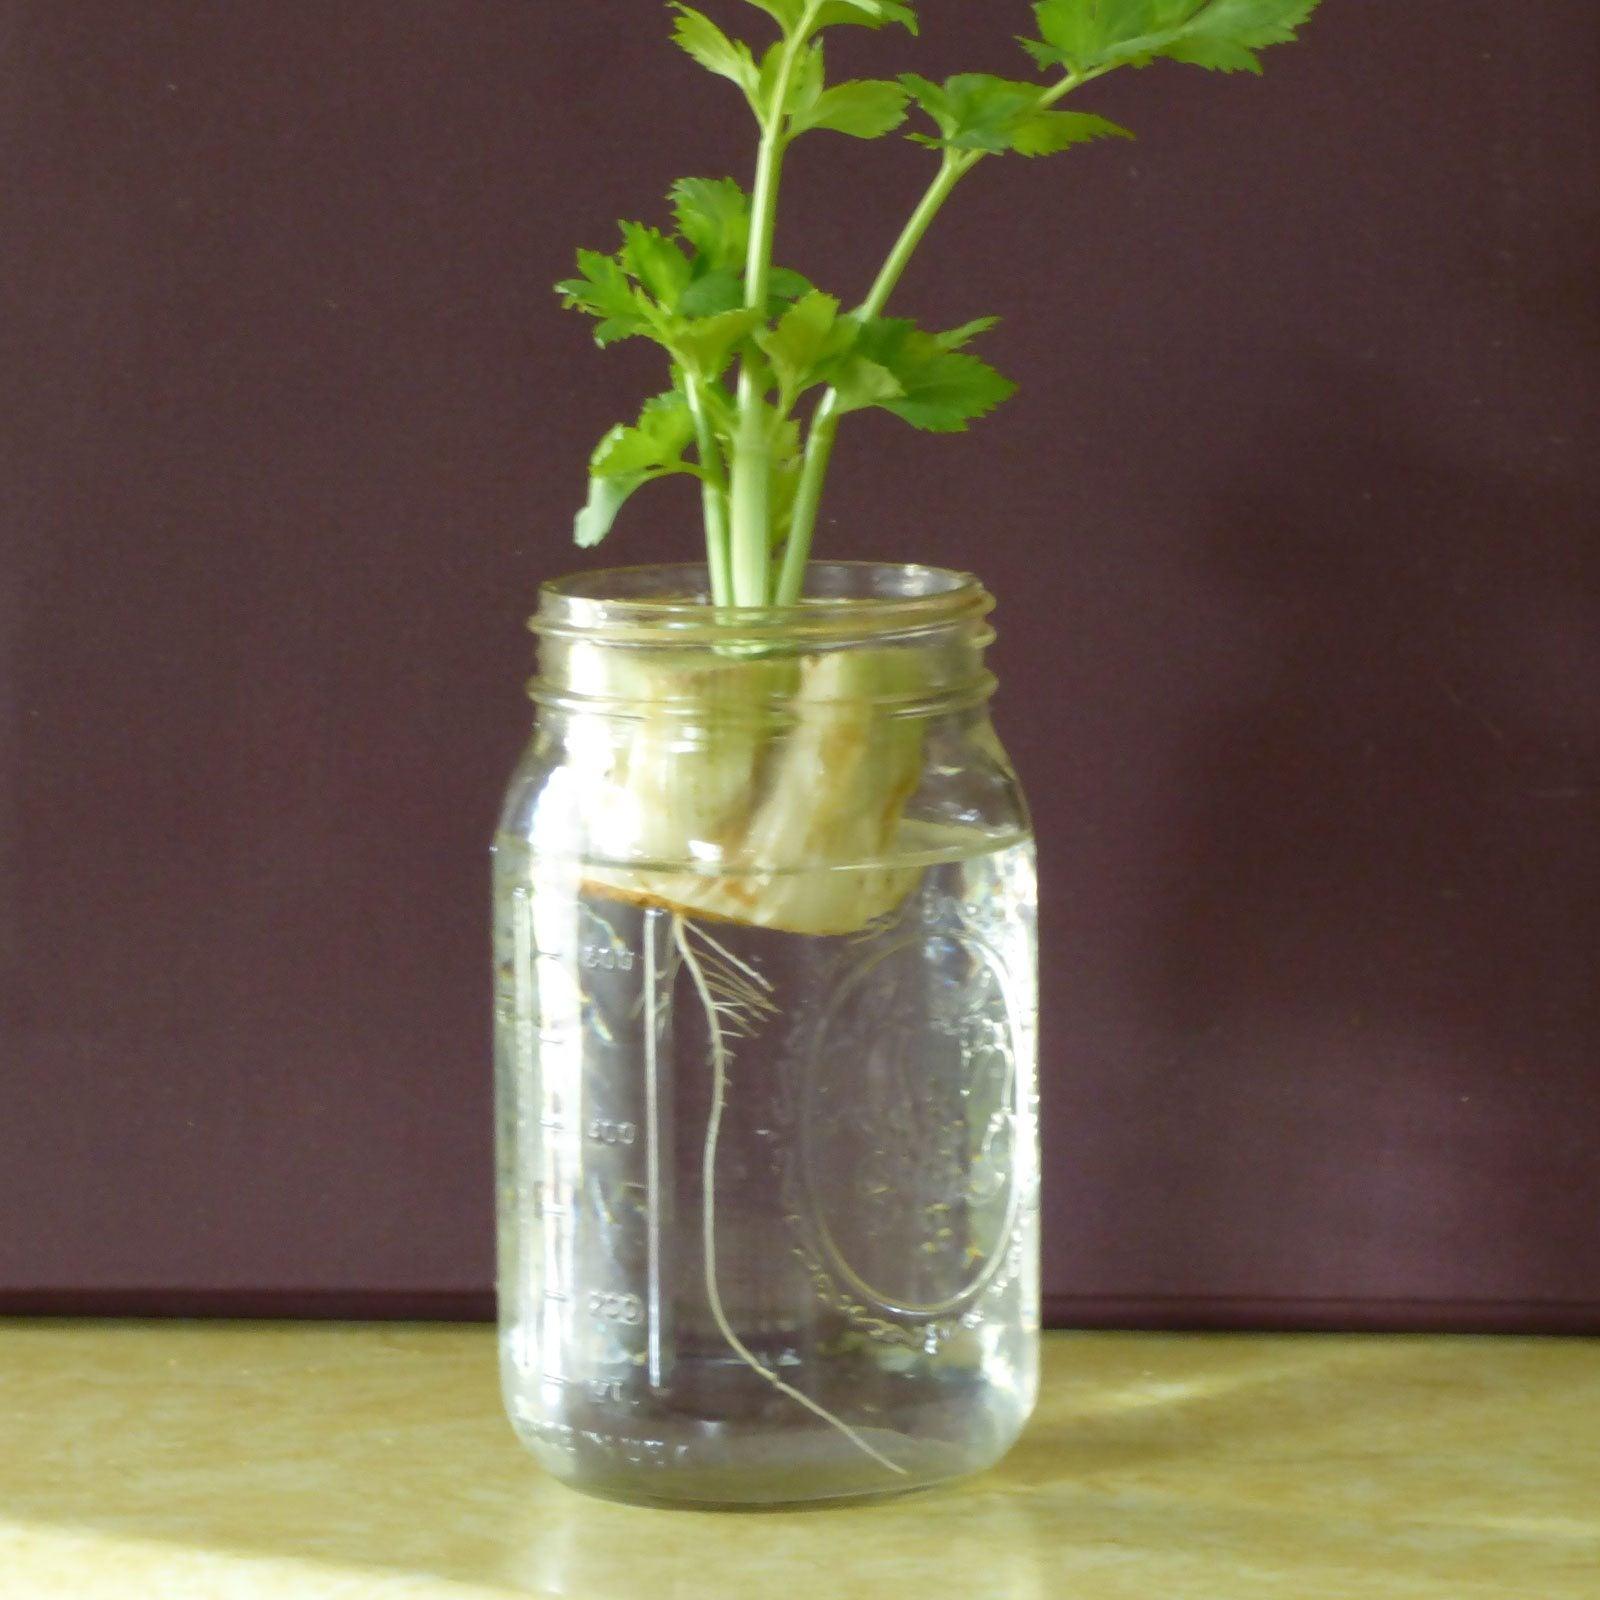 Garden Bush: Planting Celery Bottoms Outdoors